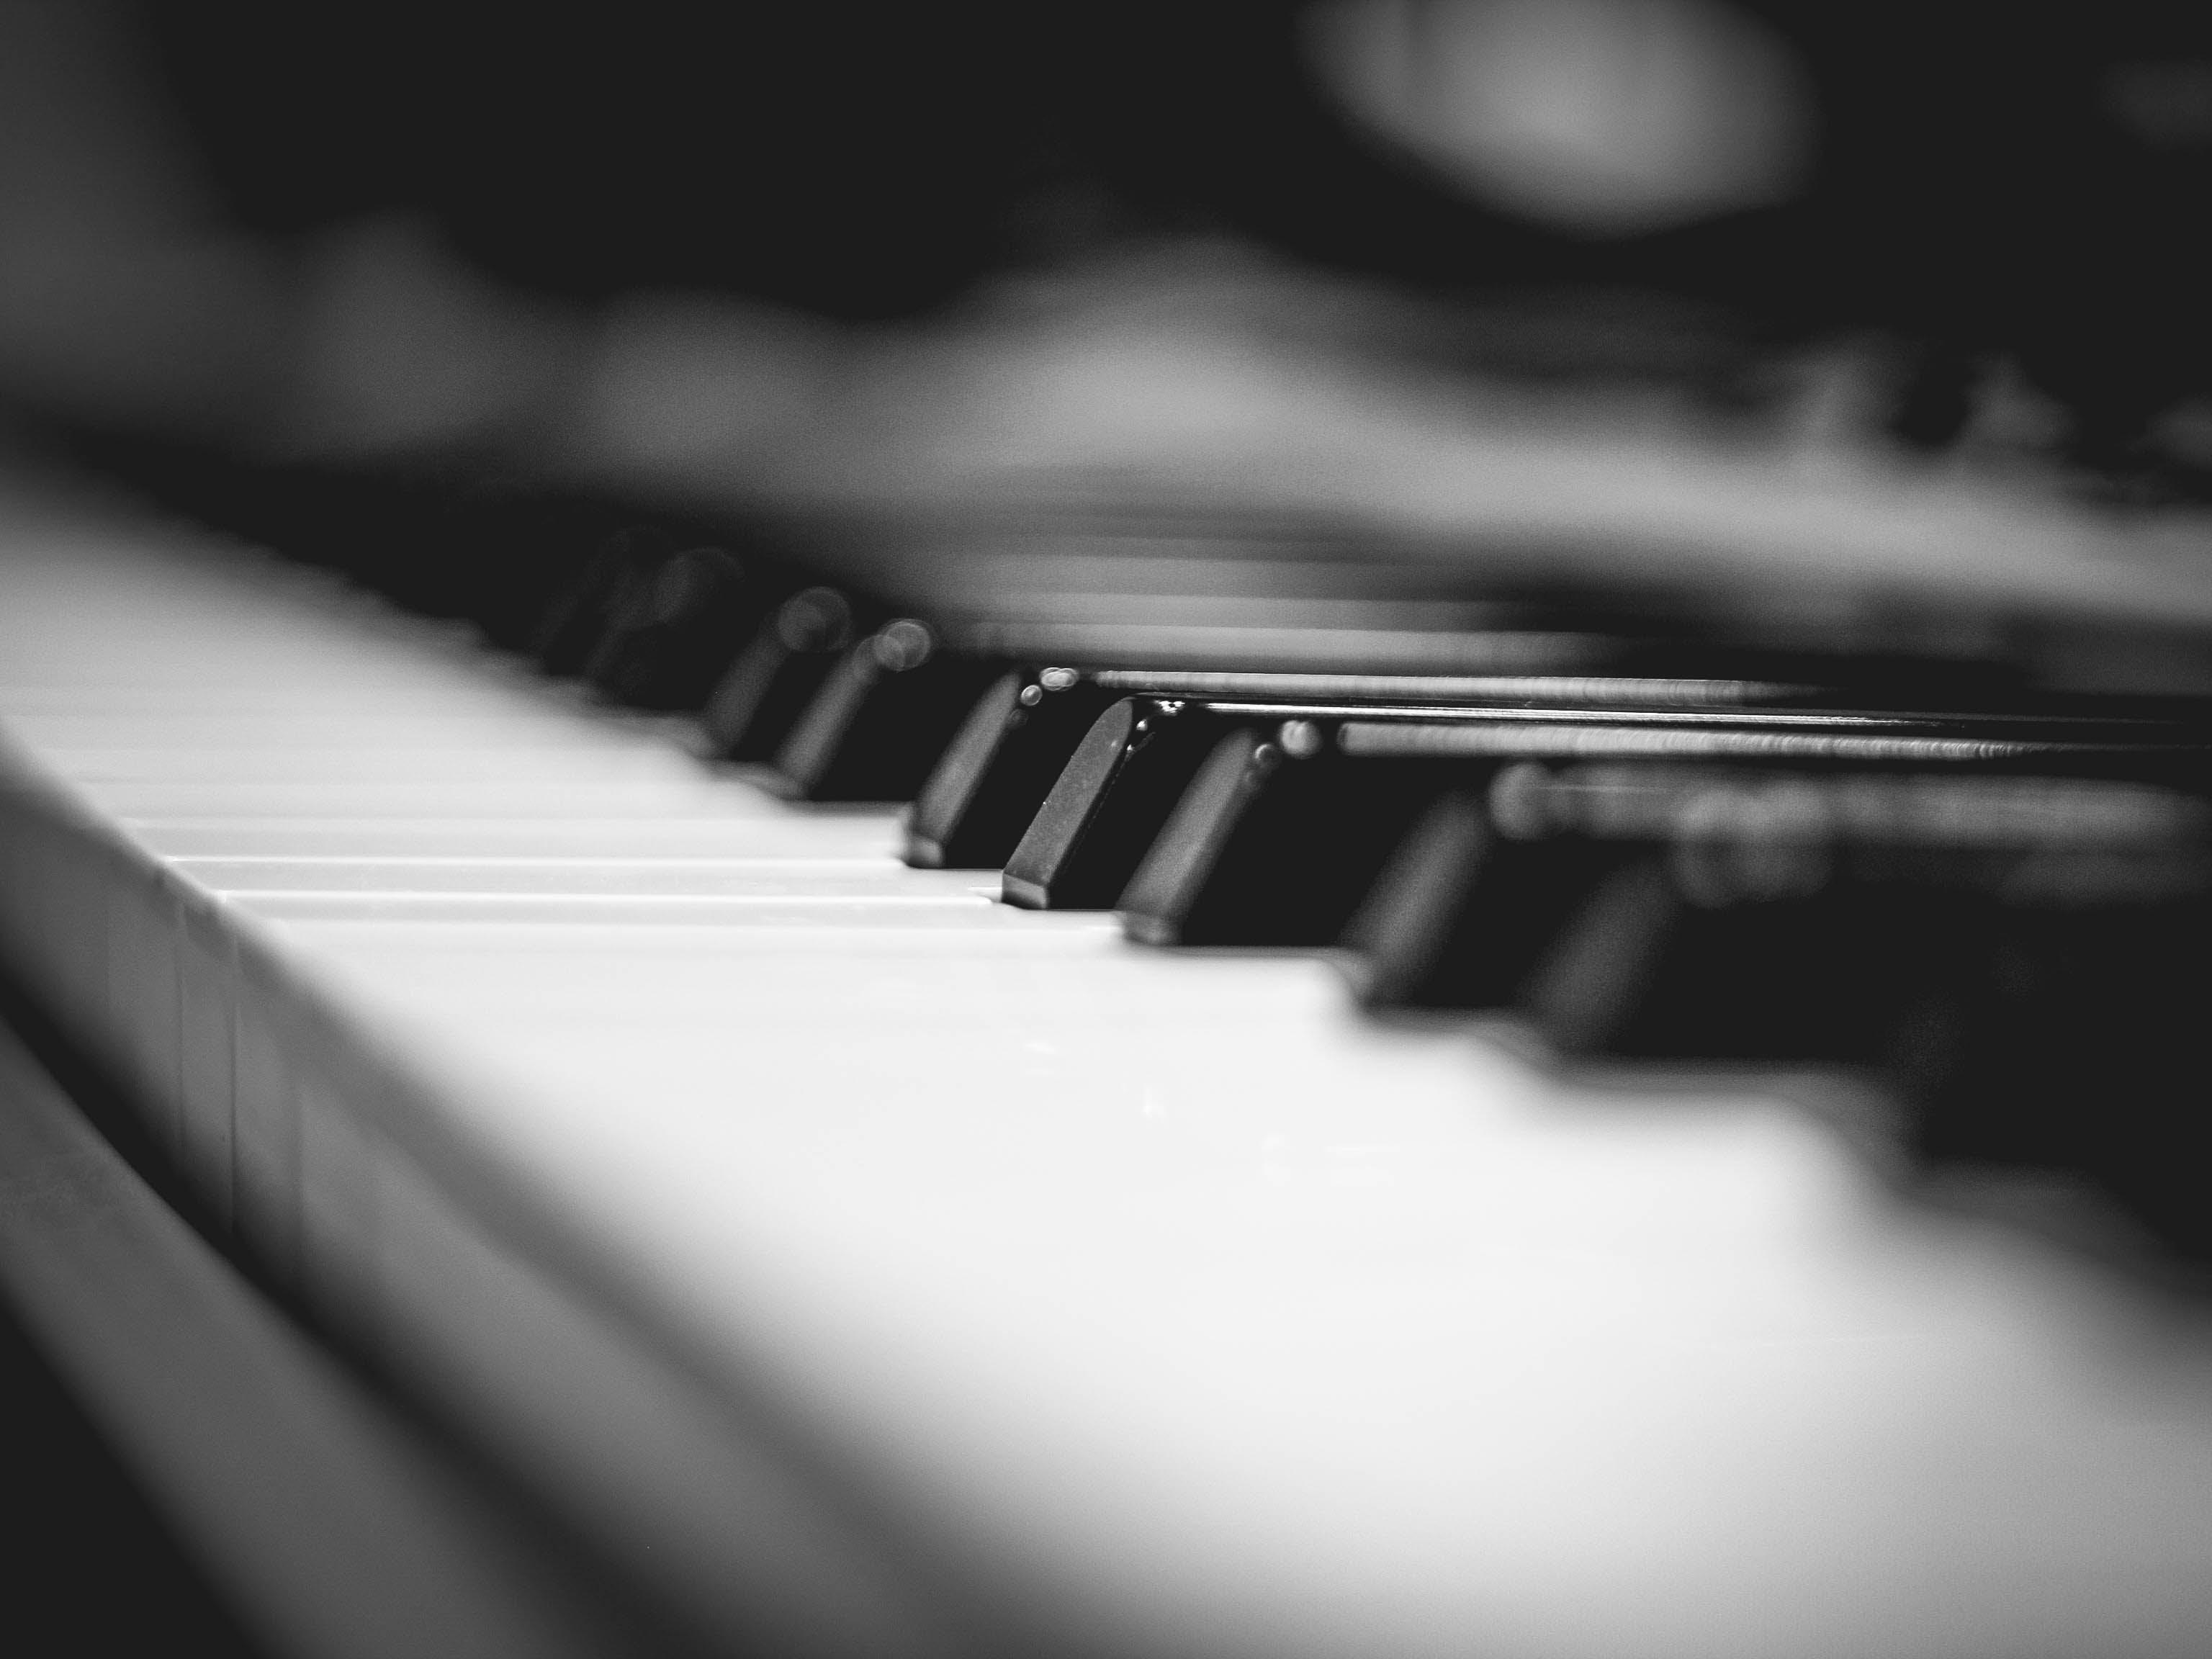 Macro Photography of Piano